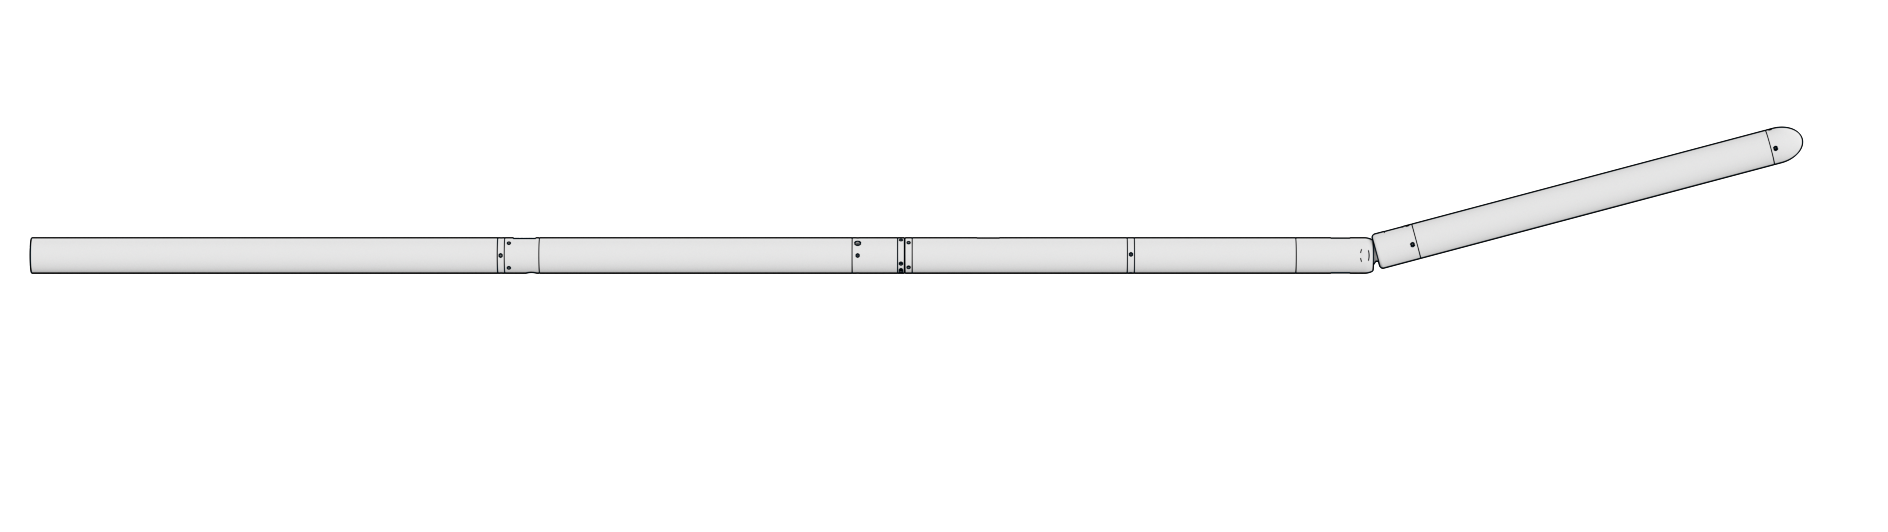 Welltec Lateral Intervention Tool - WellLIT Hori